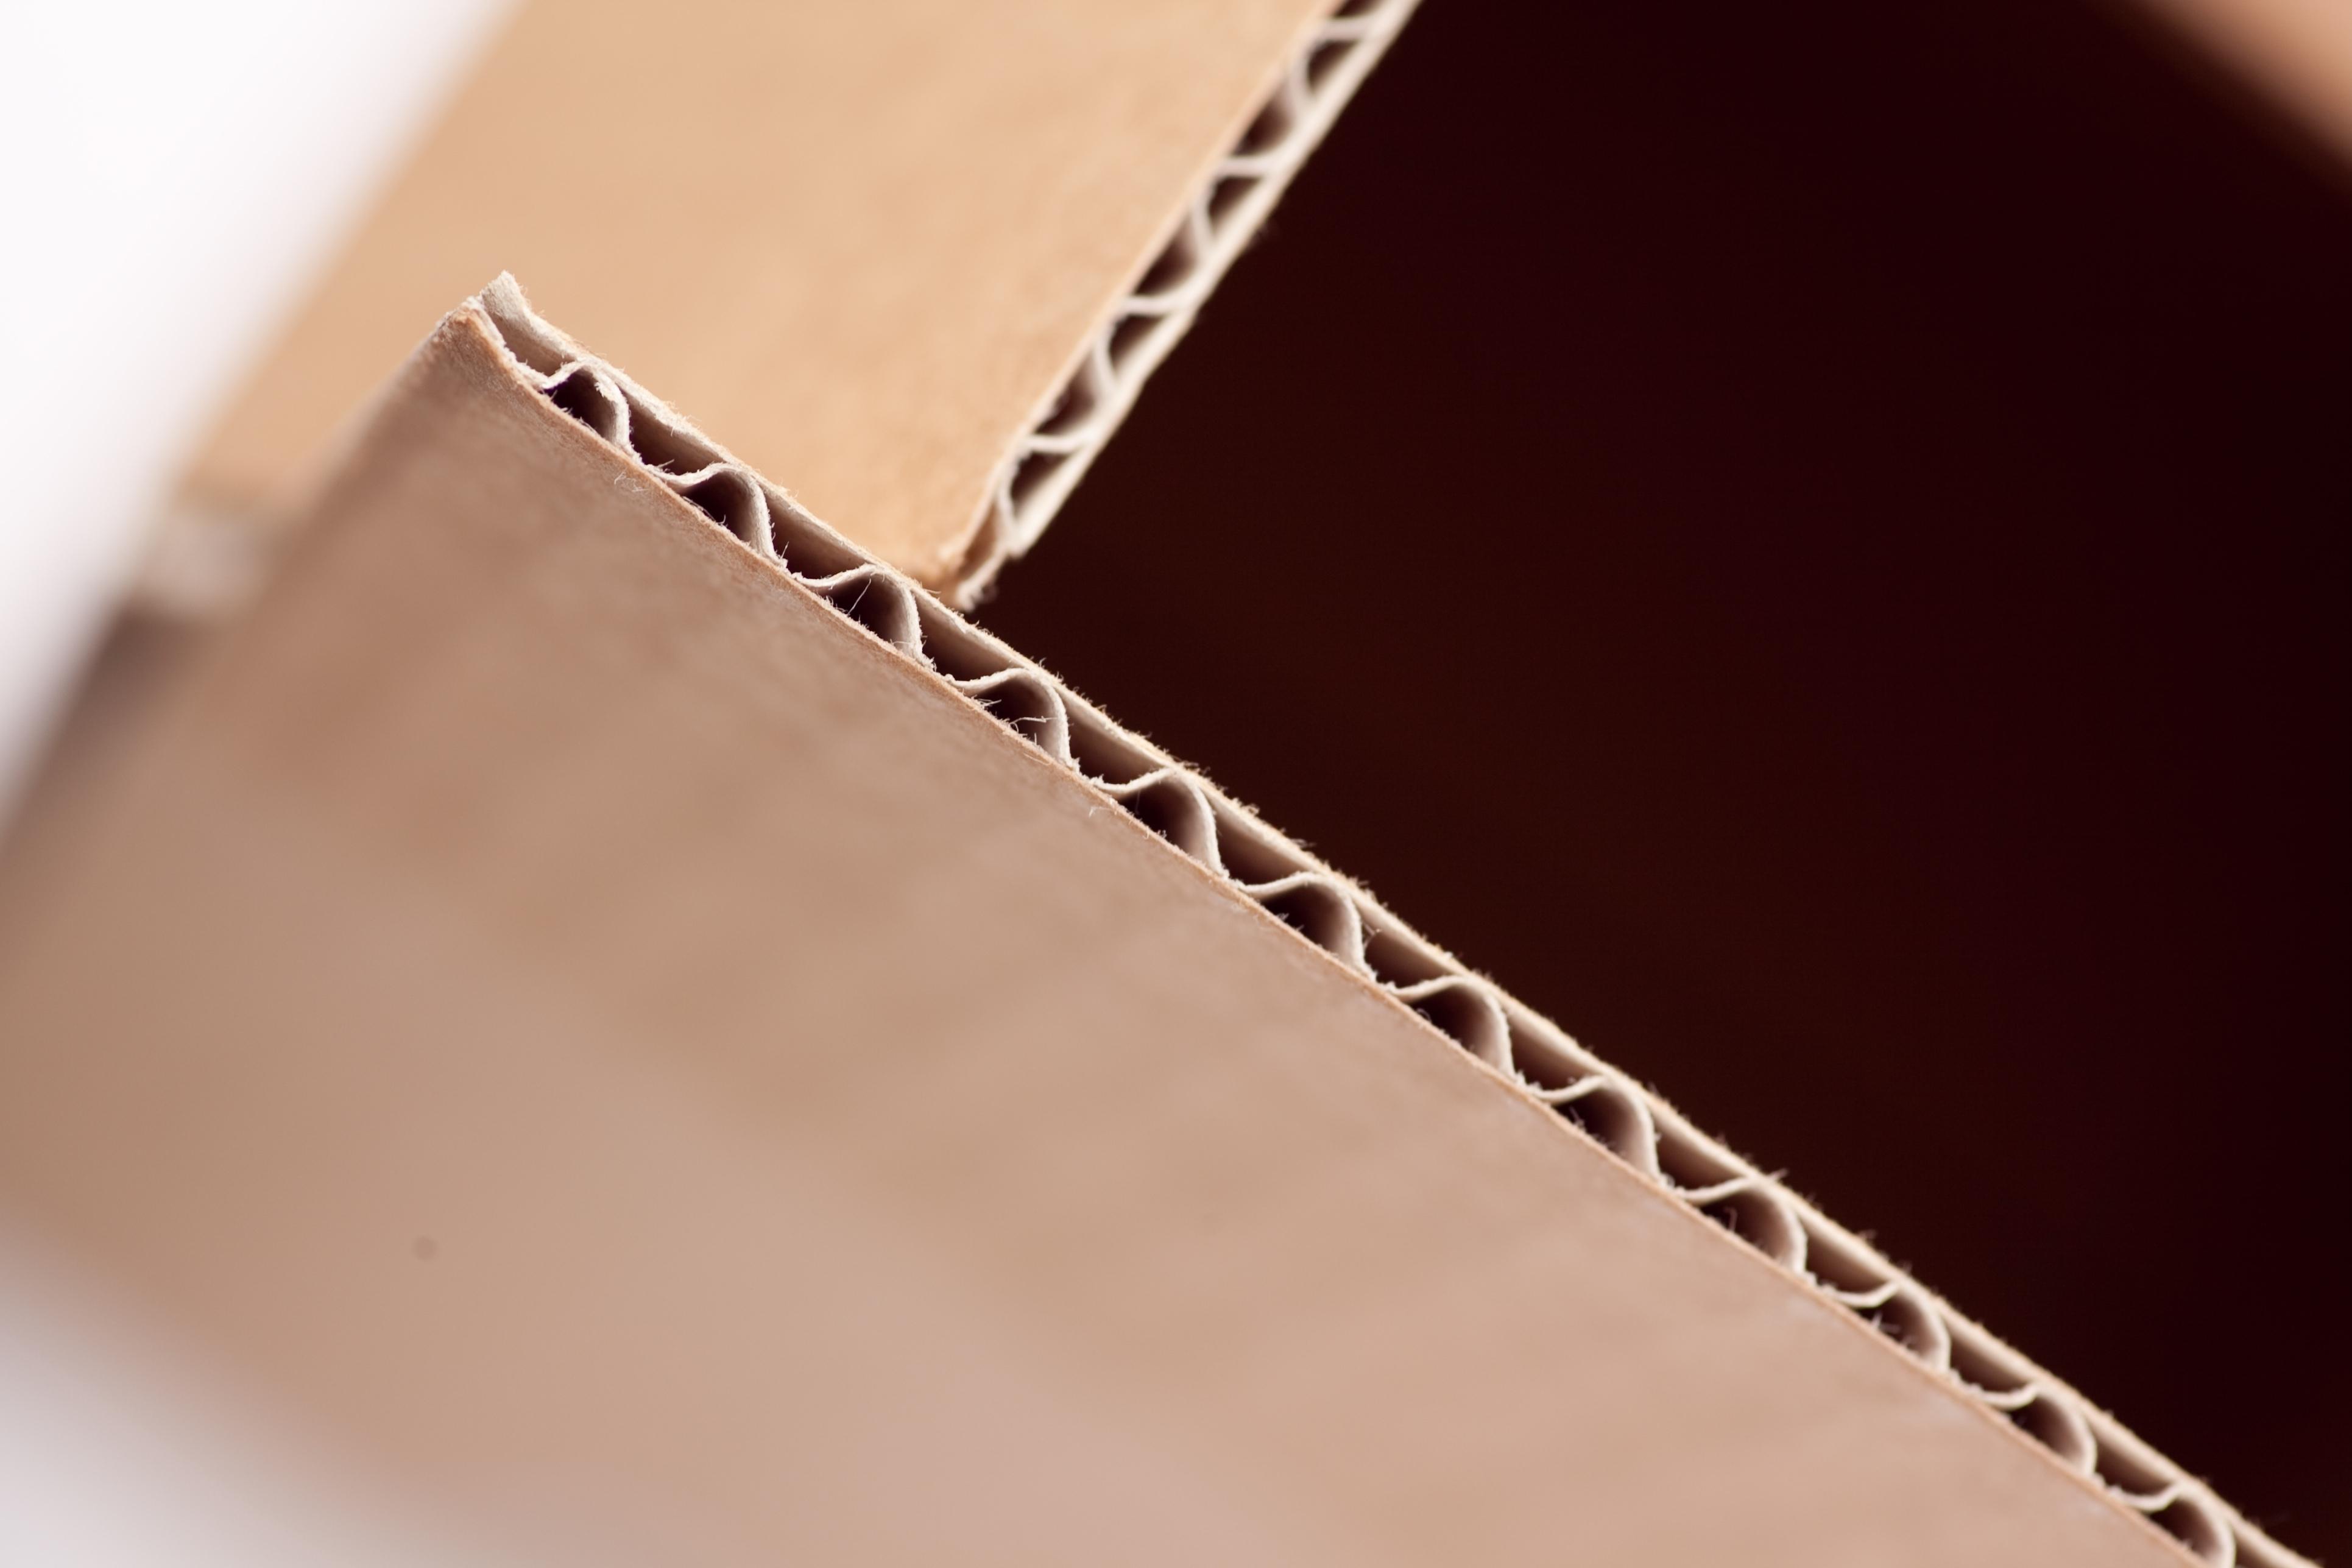 356 x 356 x 356mm Single Wall Cardboard Boxes - 4